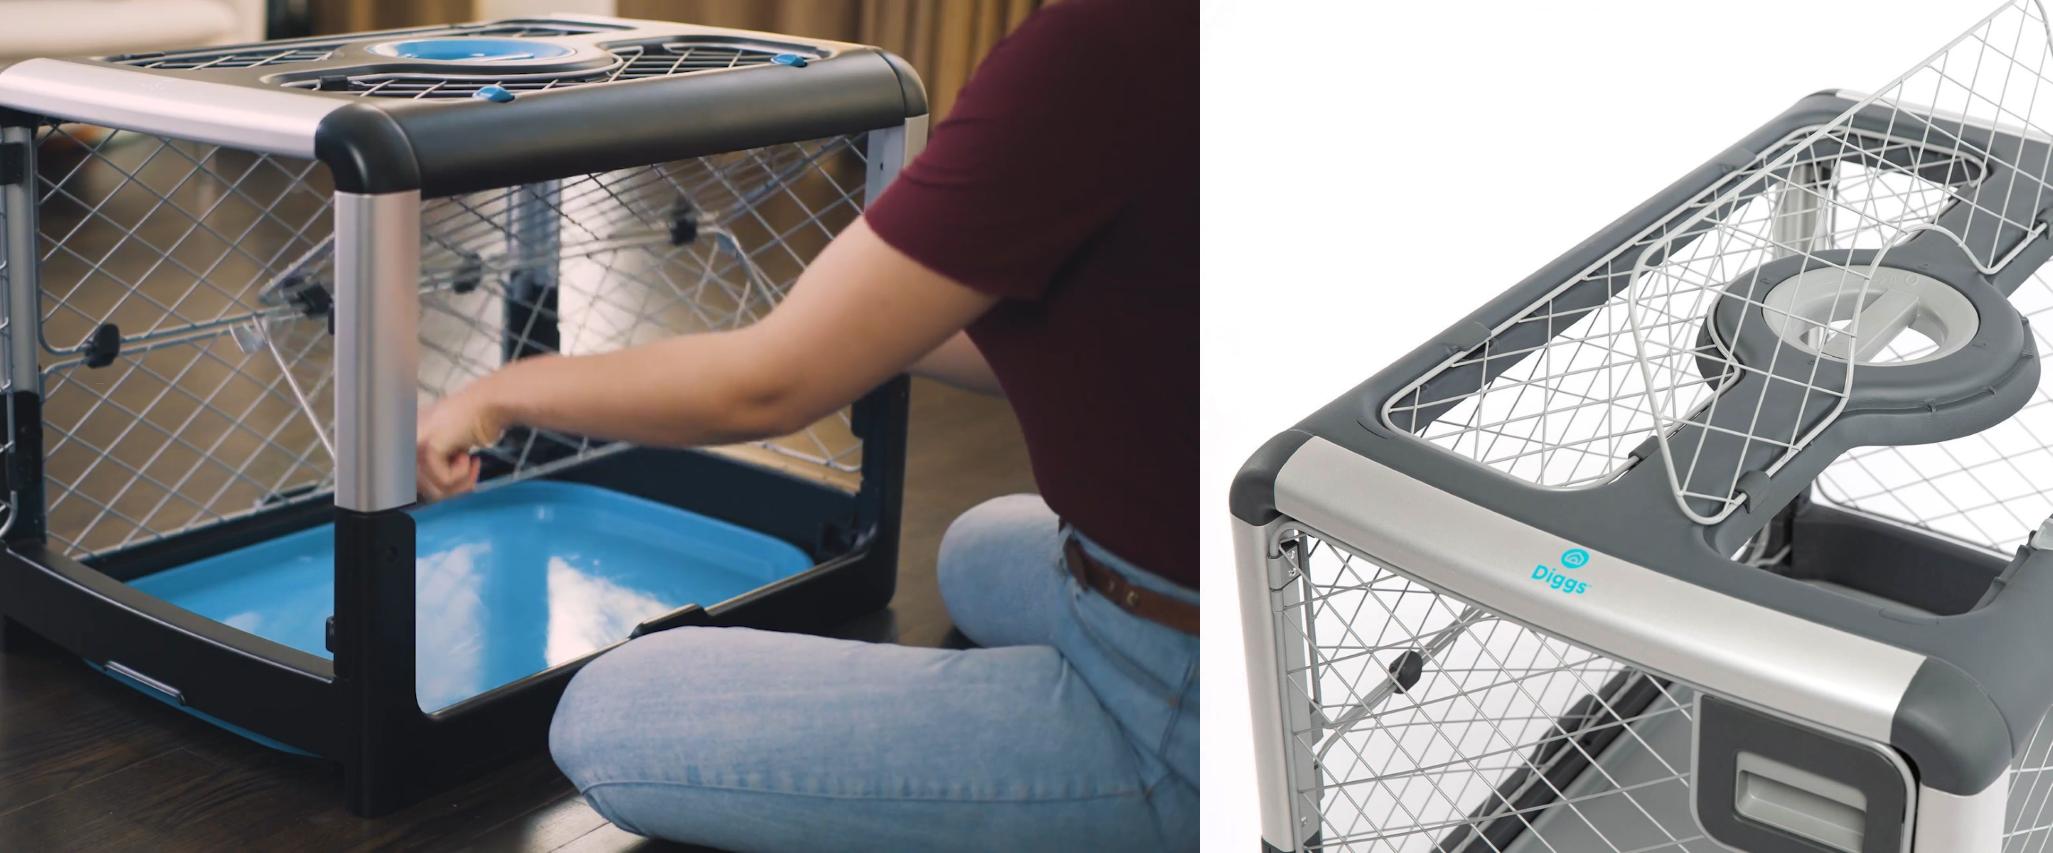 Revol Dog Crate - Accessibility